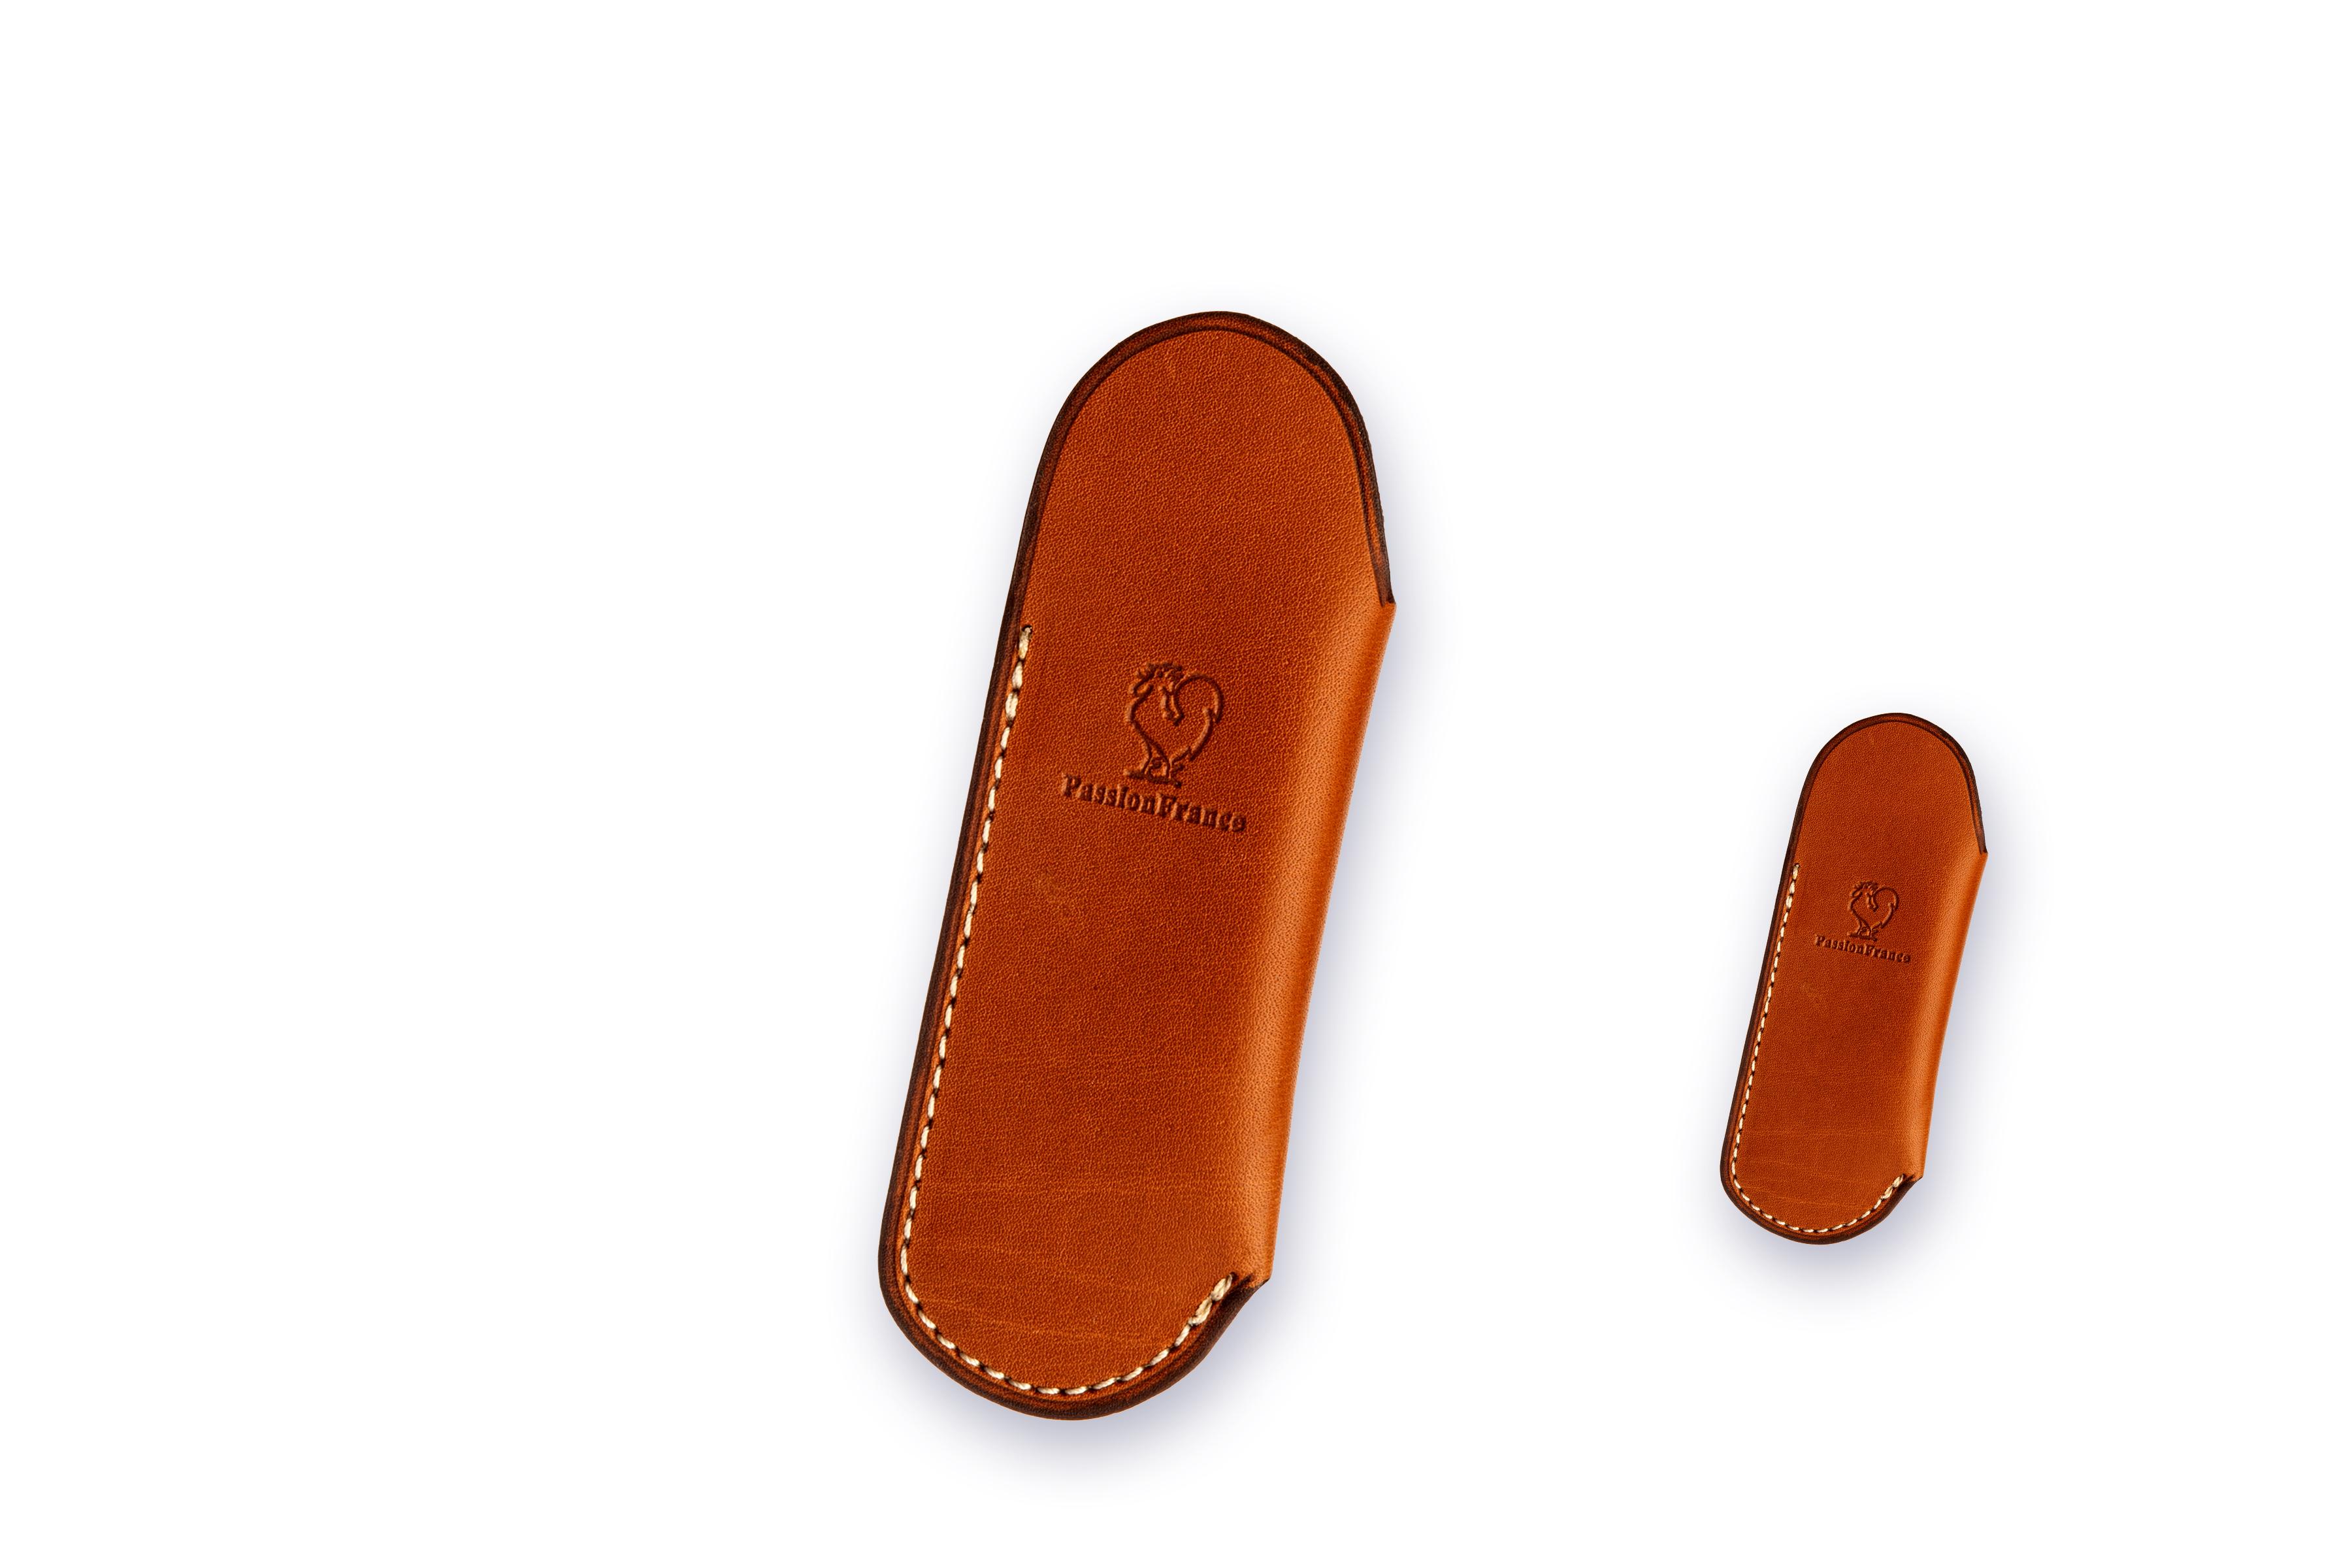 Pocket sheaths